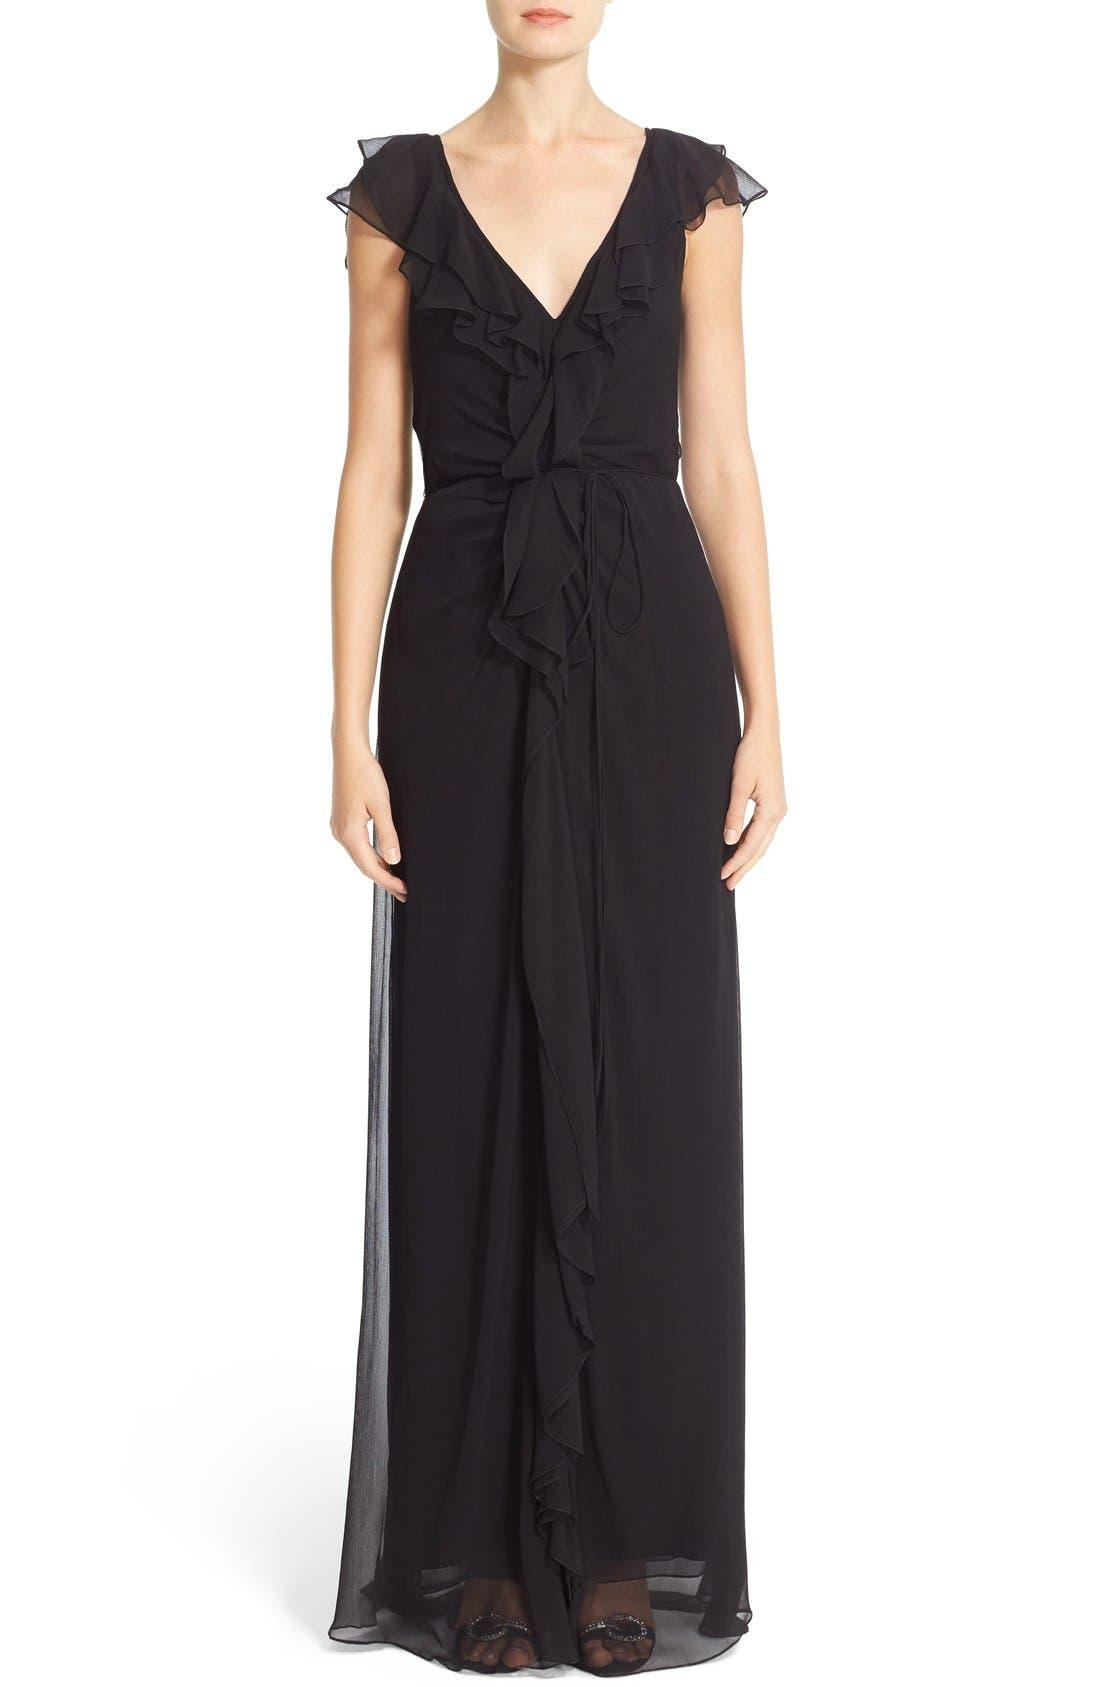 Alternate Image 1 Selected - Carolina Herrera Ruffled Chiffon Column Gown